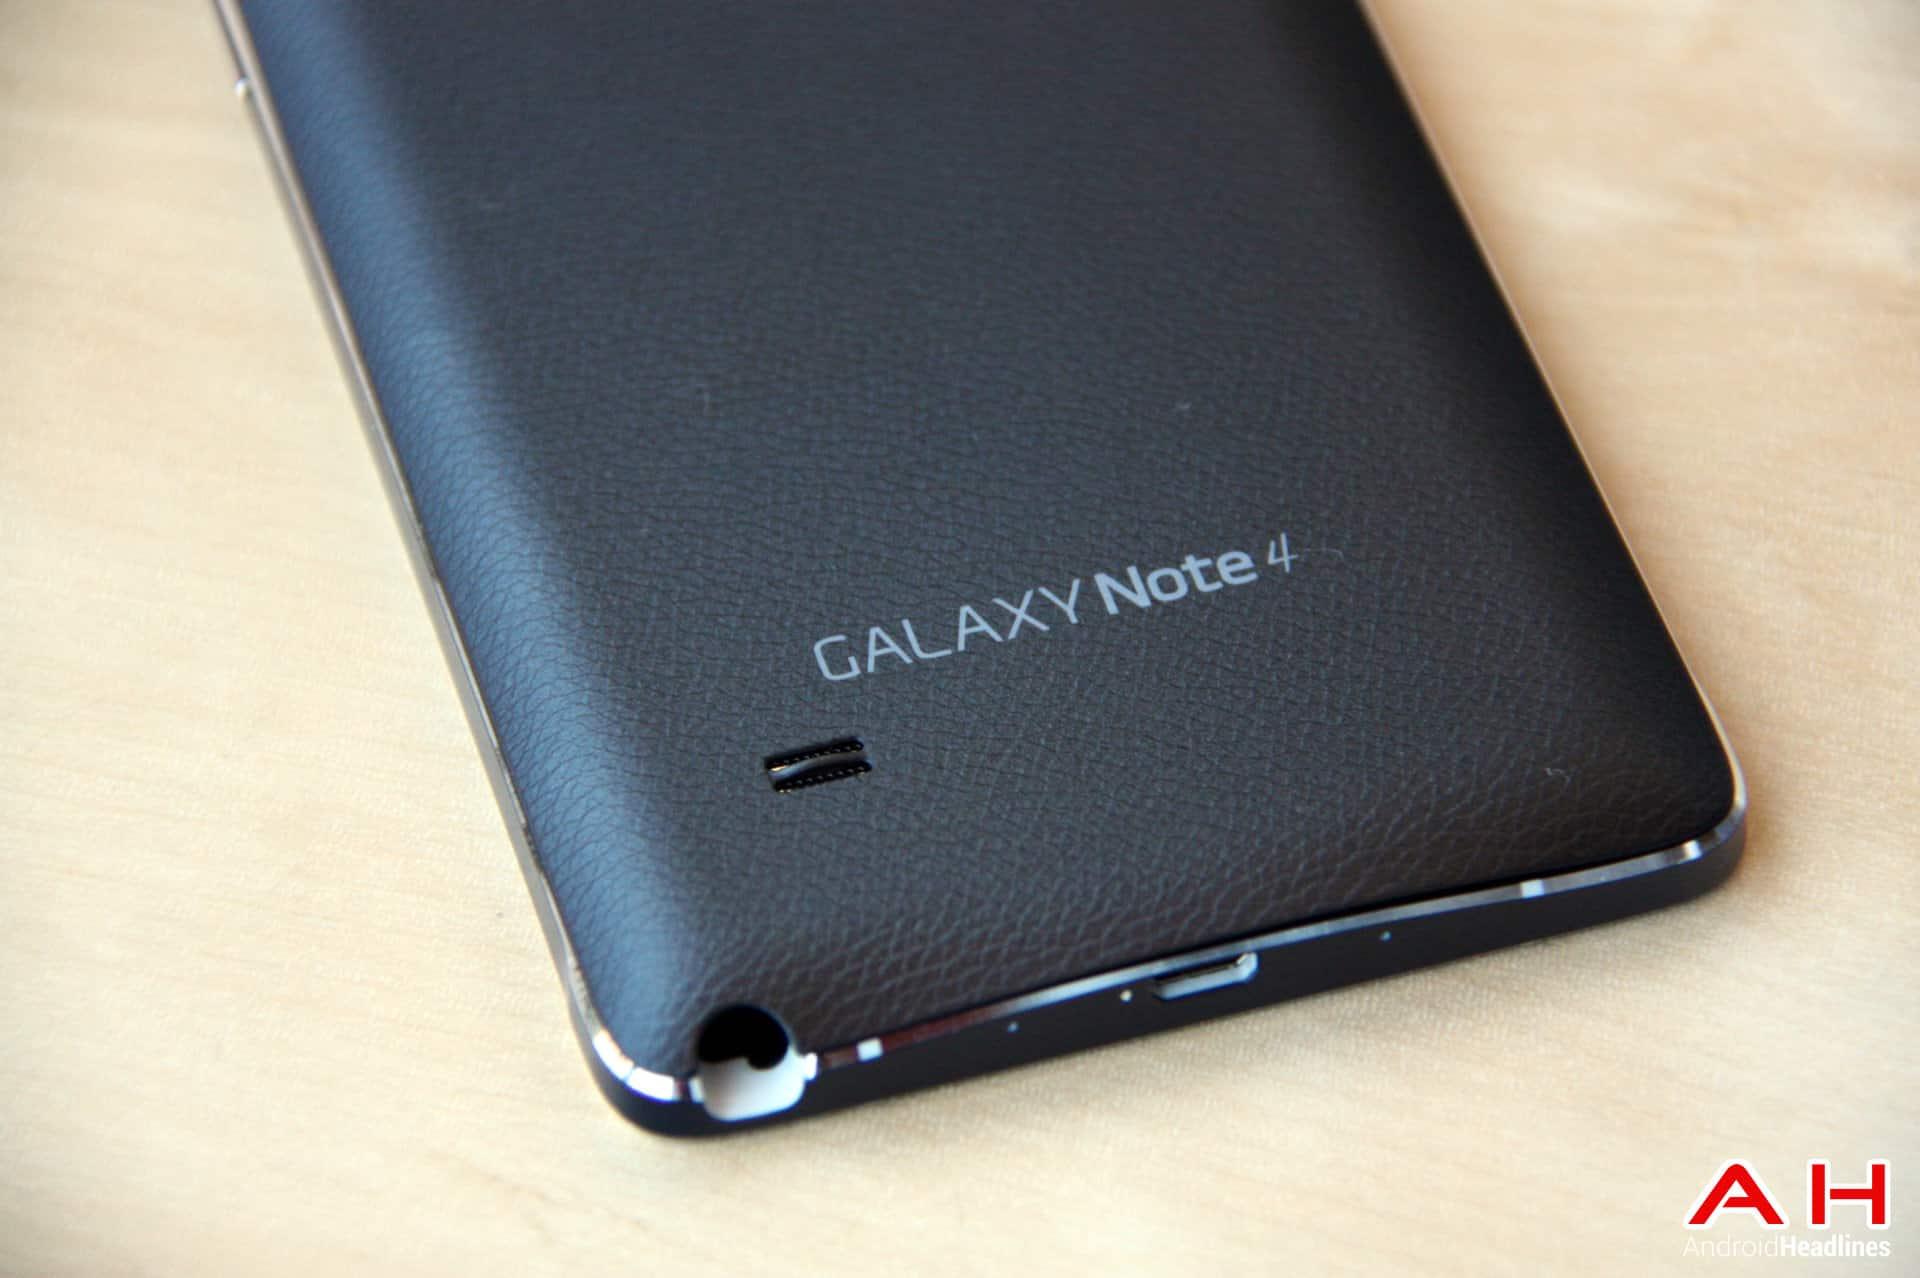 AH Samsung Note 4 - John-8